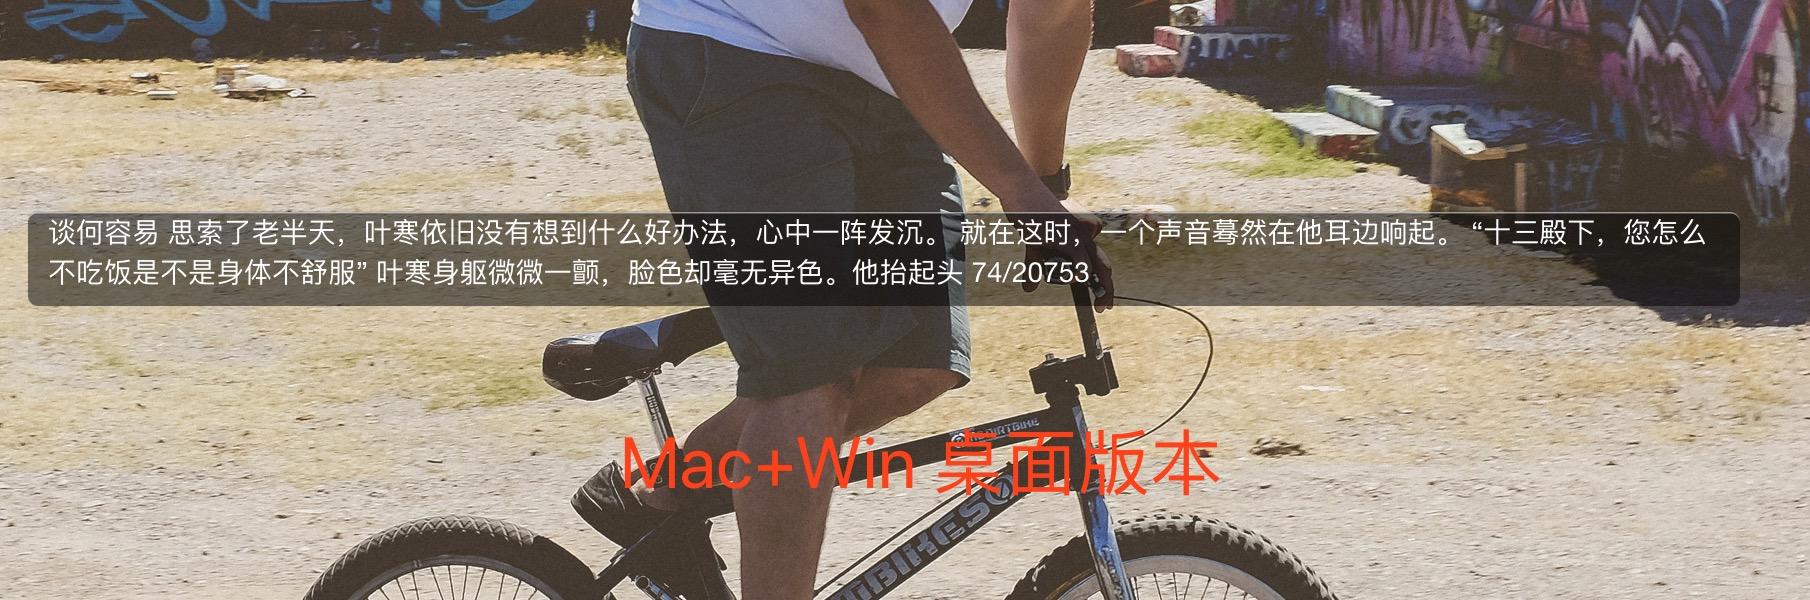 Thief-Book - 上班摸鱼神器:在屏幕小区域上阅读小说[Win/macOS/VS Code] 3